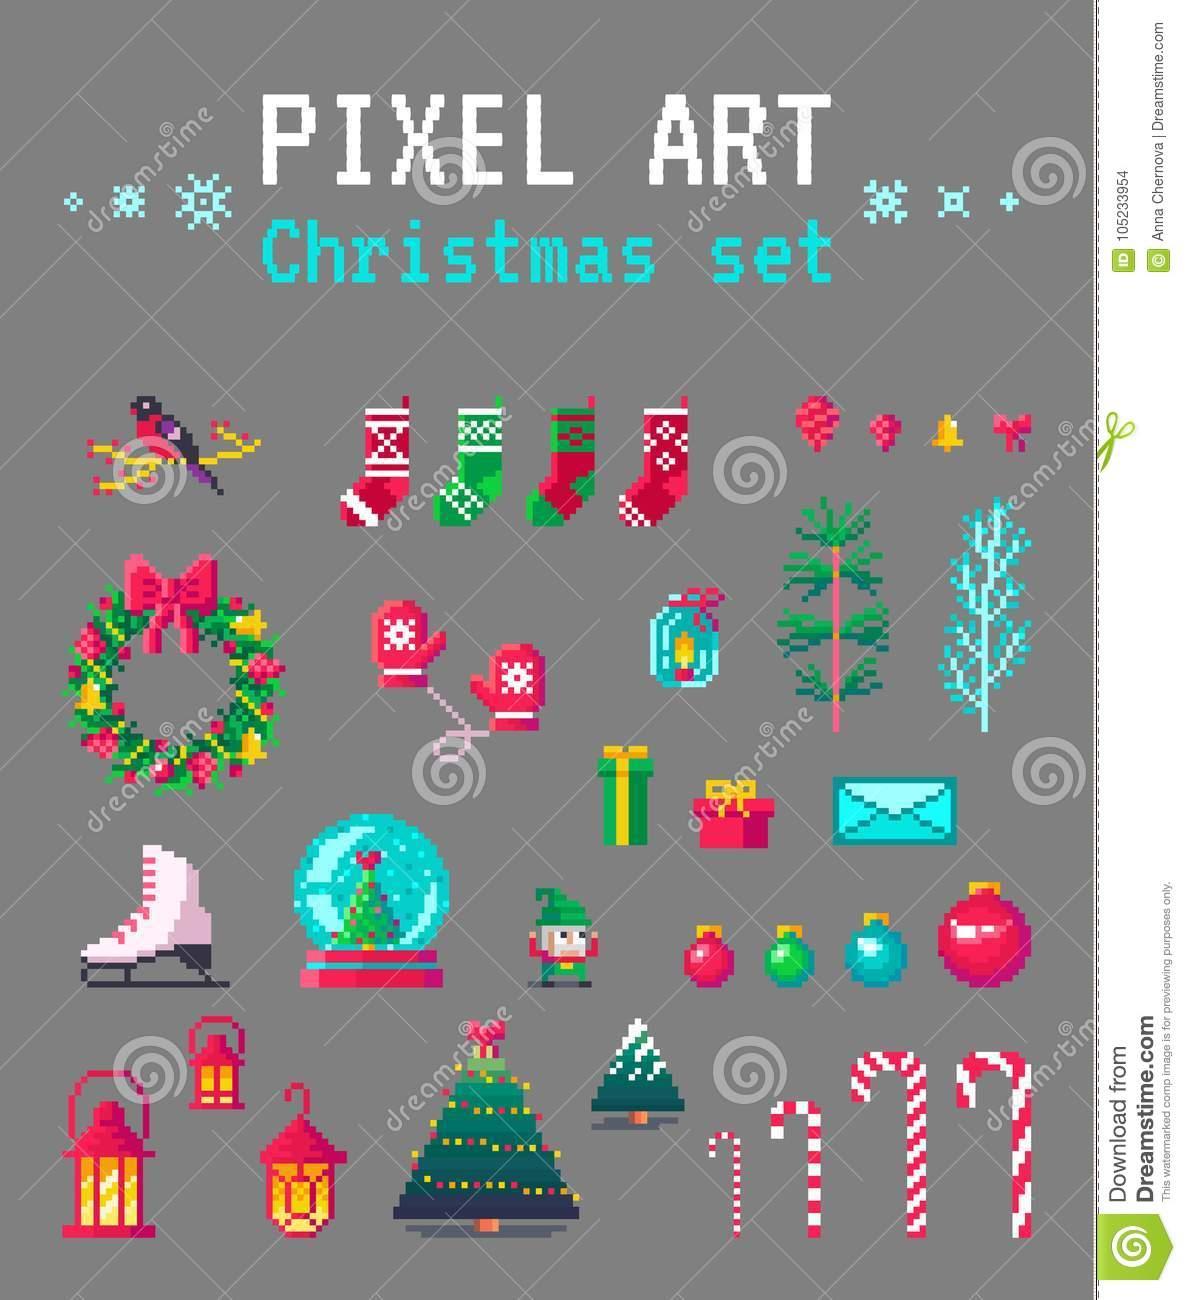 Cute Pixel Art Christmas Set For Design. Stock Vector avec Pixel Art De Noël